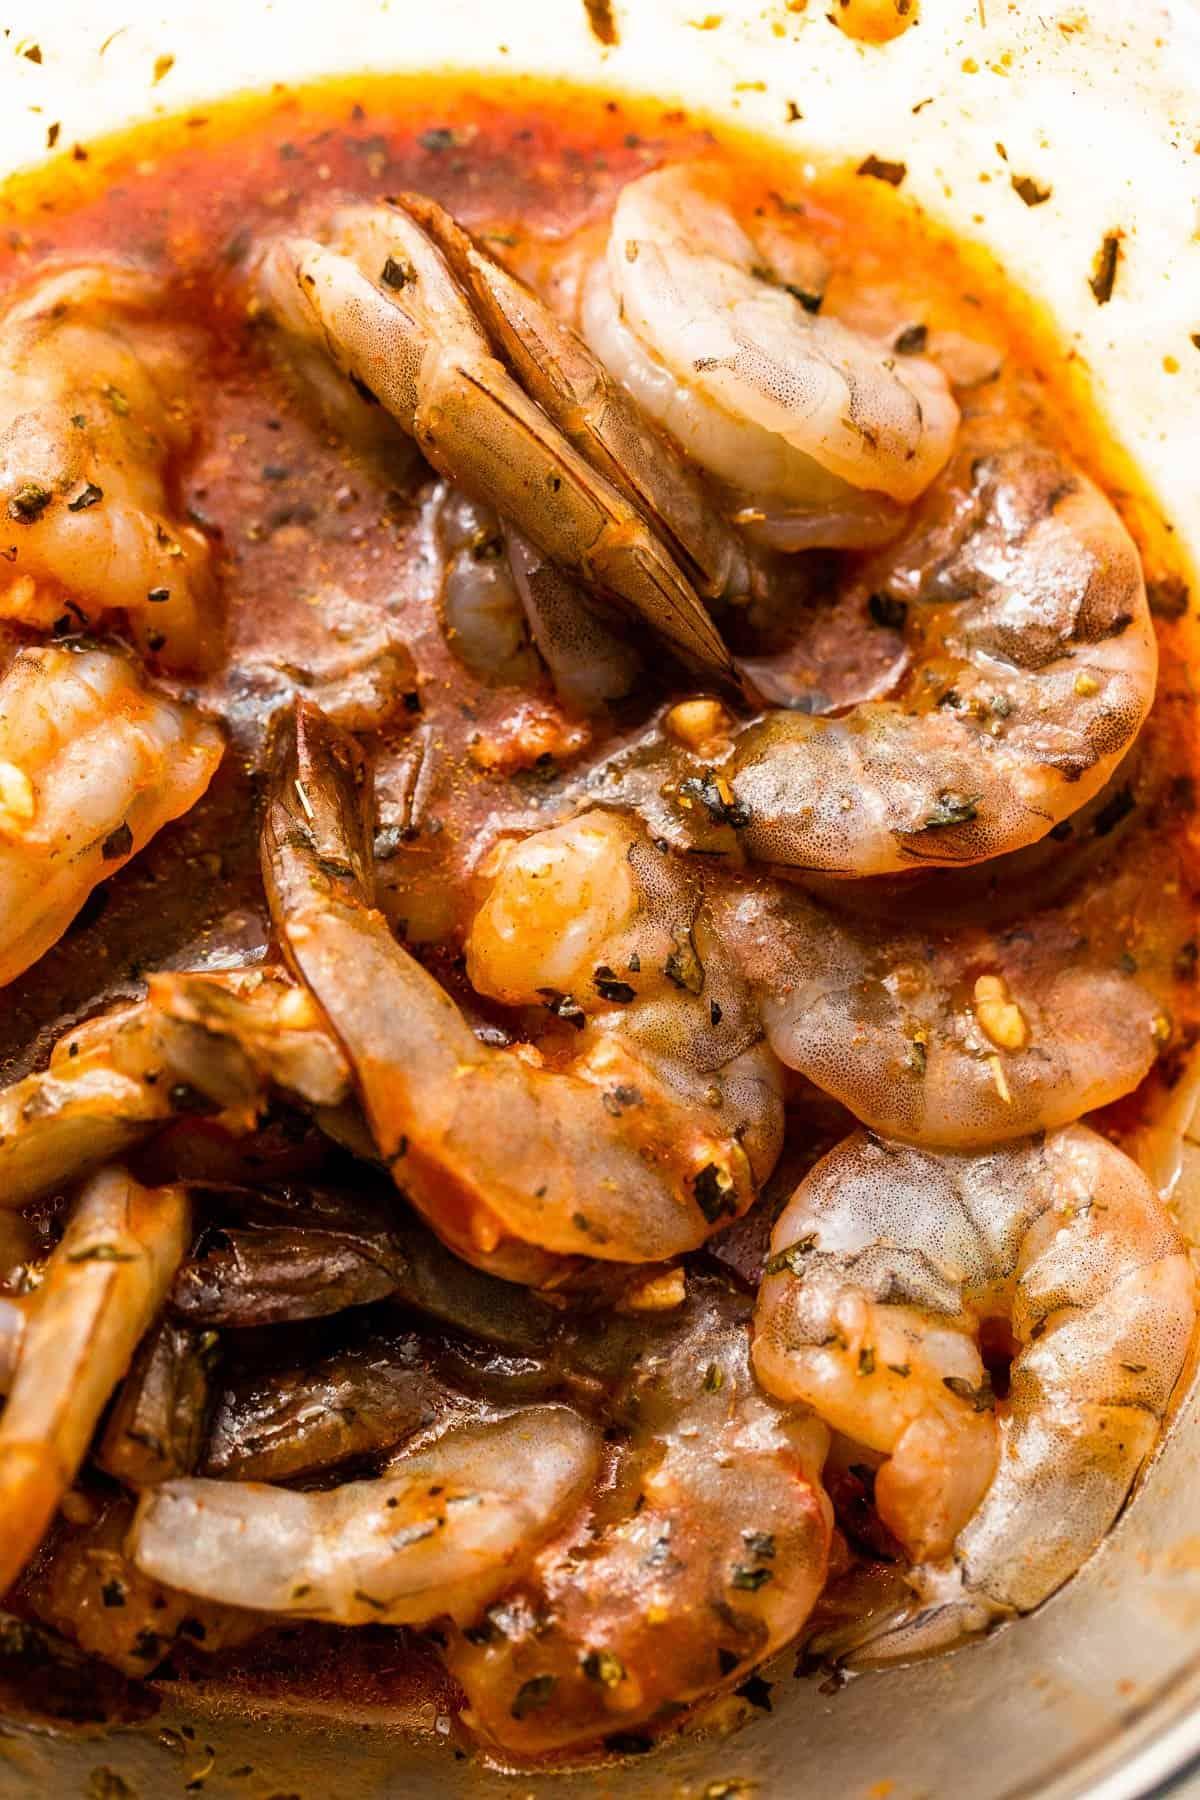 marinating raw shrimp in tomato sauce